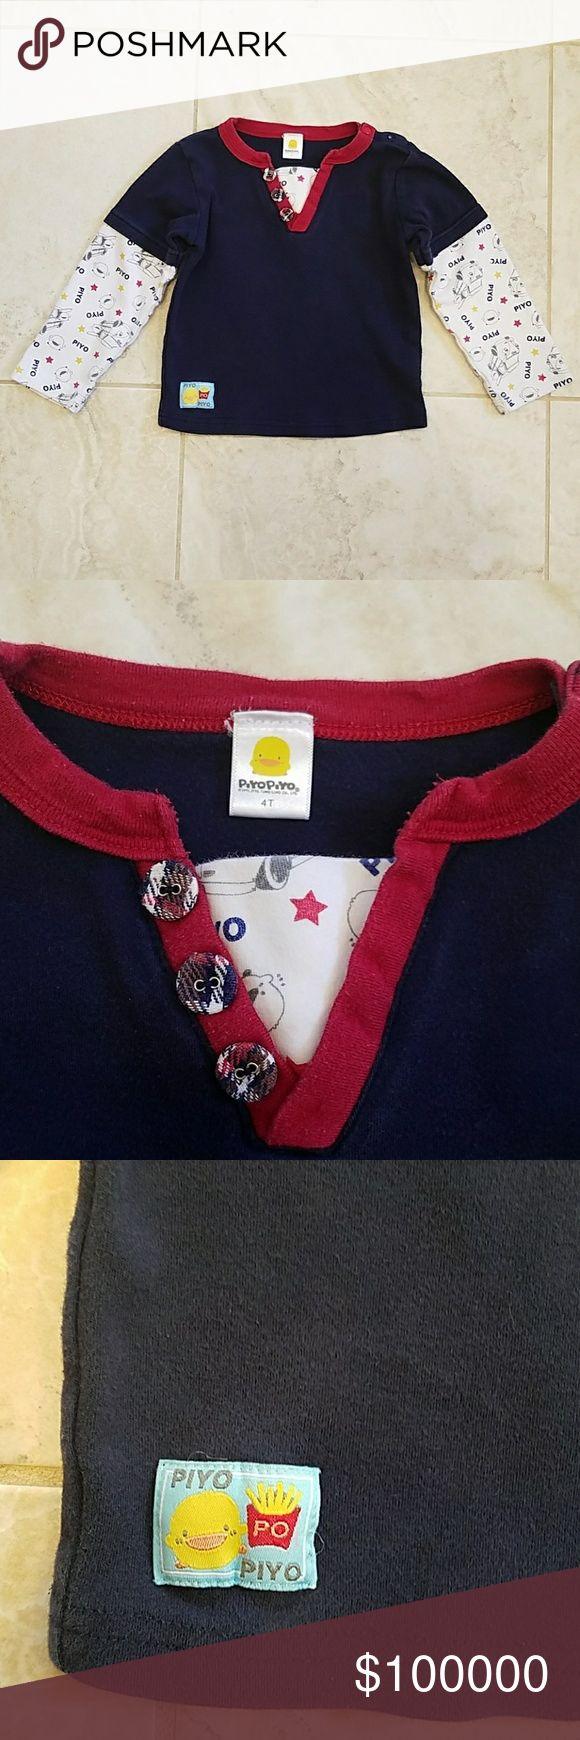 4T PIYO PIYO long sleeve shirt 4T PIYO PIYO long sleeve shirt. No stain or rip. It is inan exceelent condition.  100% cotton. PIYO PIYO Shirts & Tops Tees - Long Sleeve